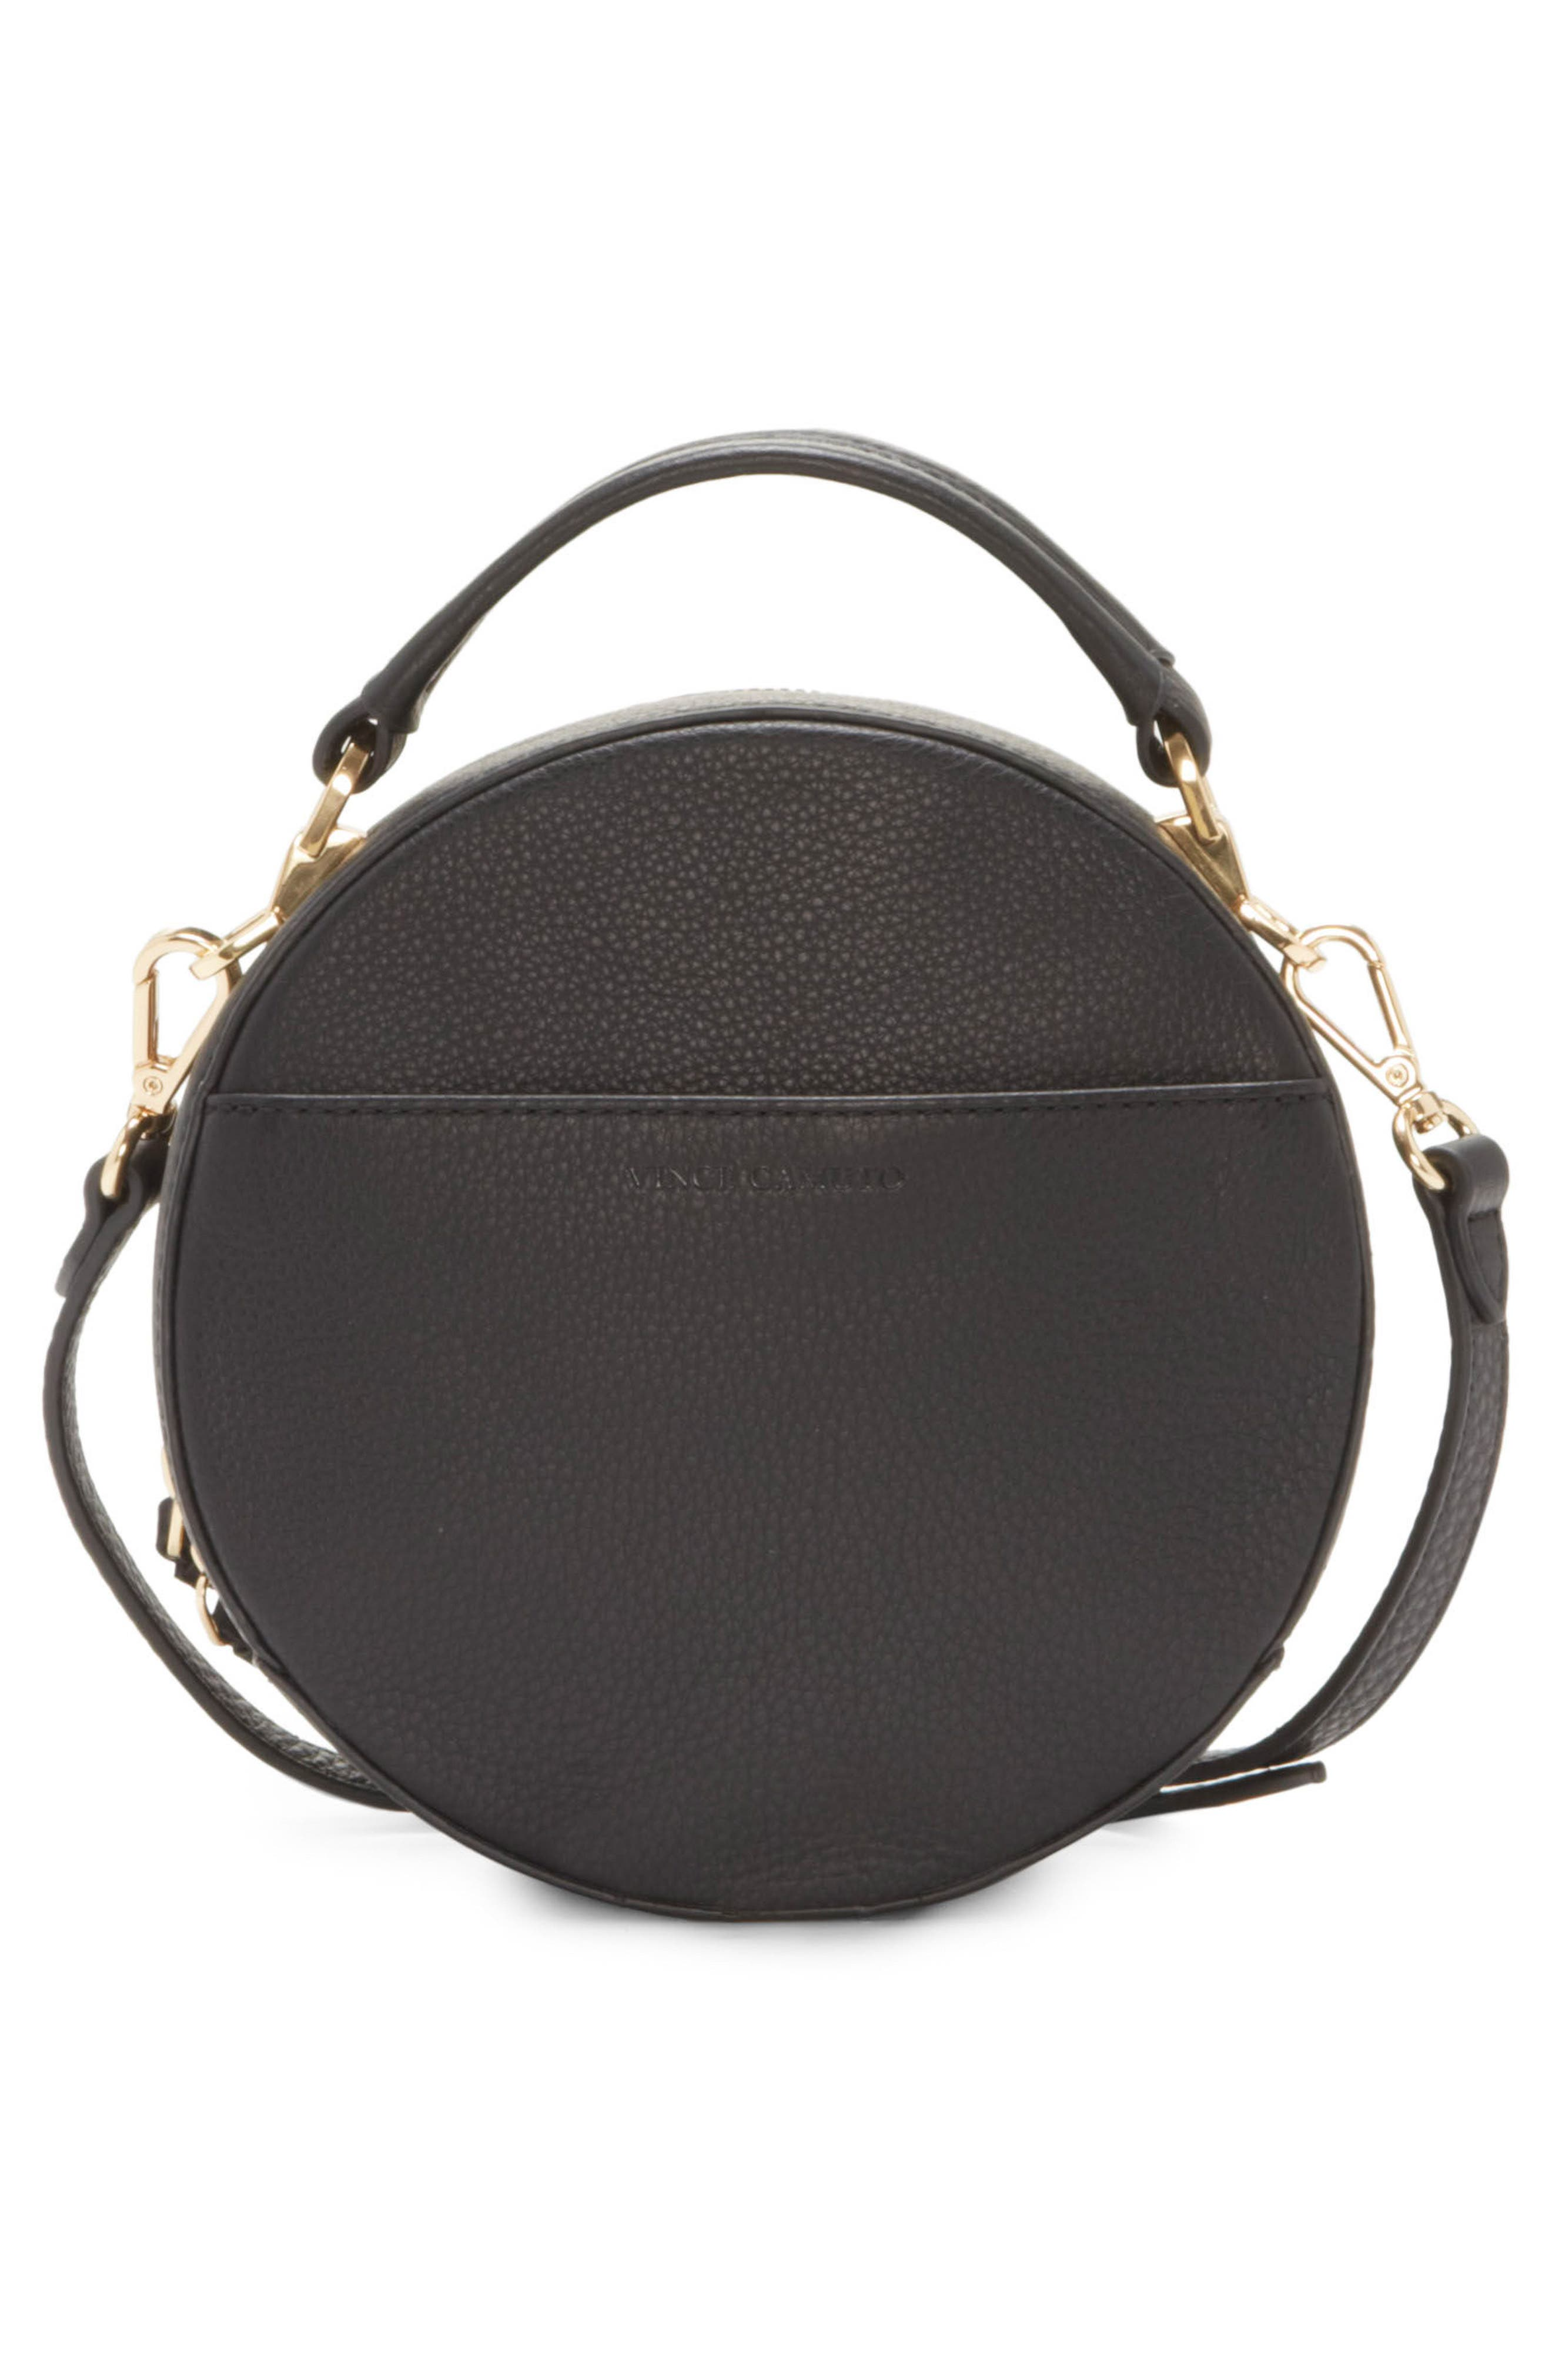 Bray Leather Crossbody Bag,                             Alternate thumbnail 2, color,                             Black